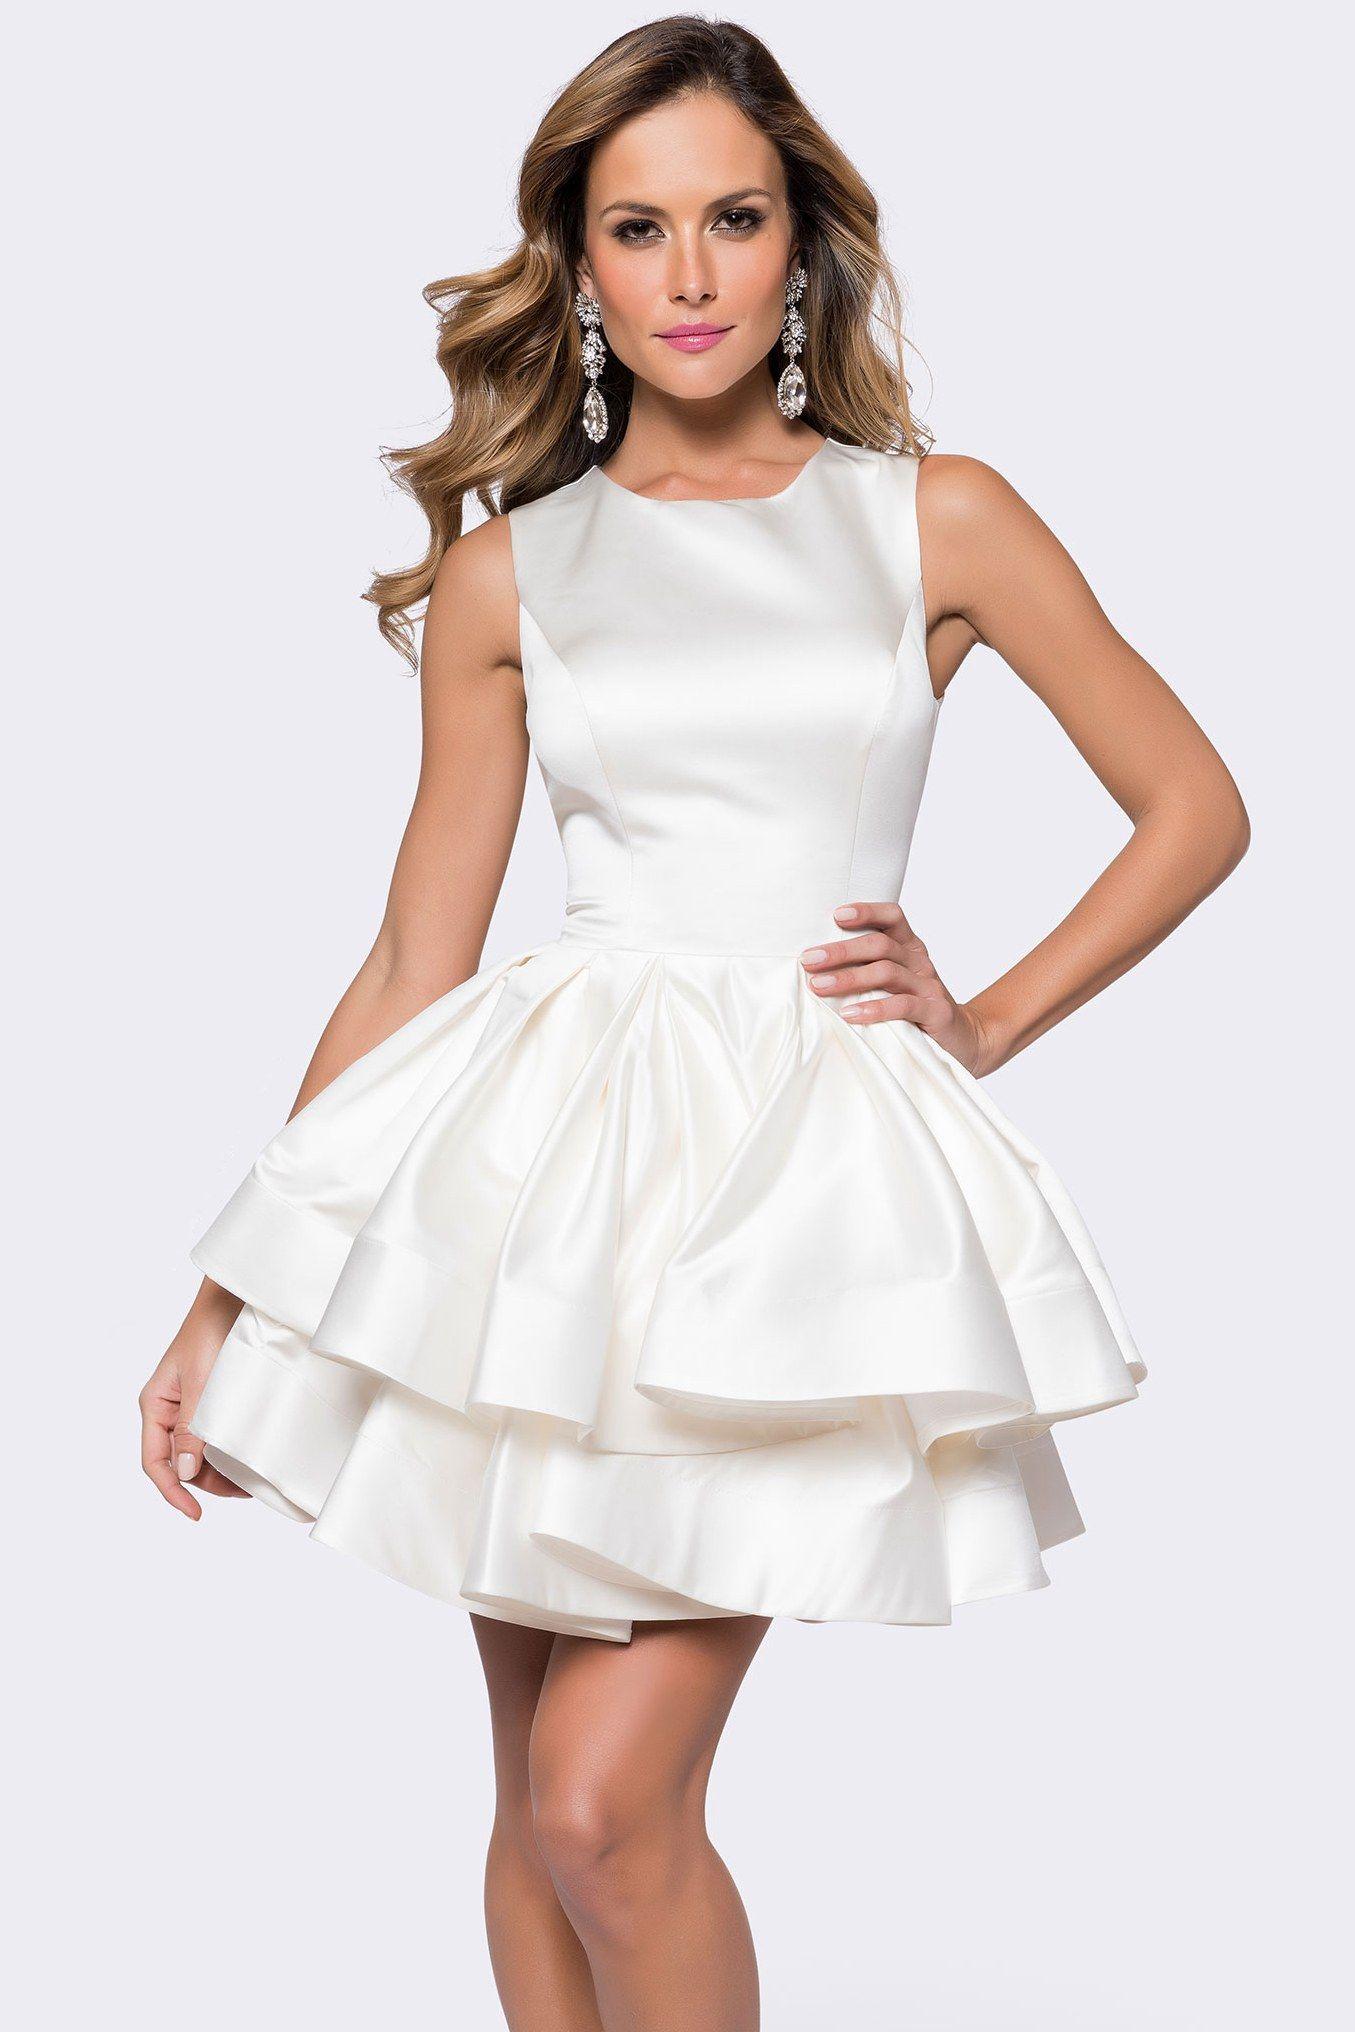 Free shipping u free custom made buy cheap prom dresses party